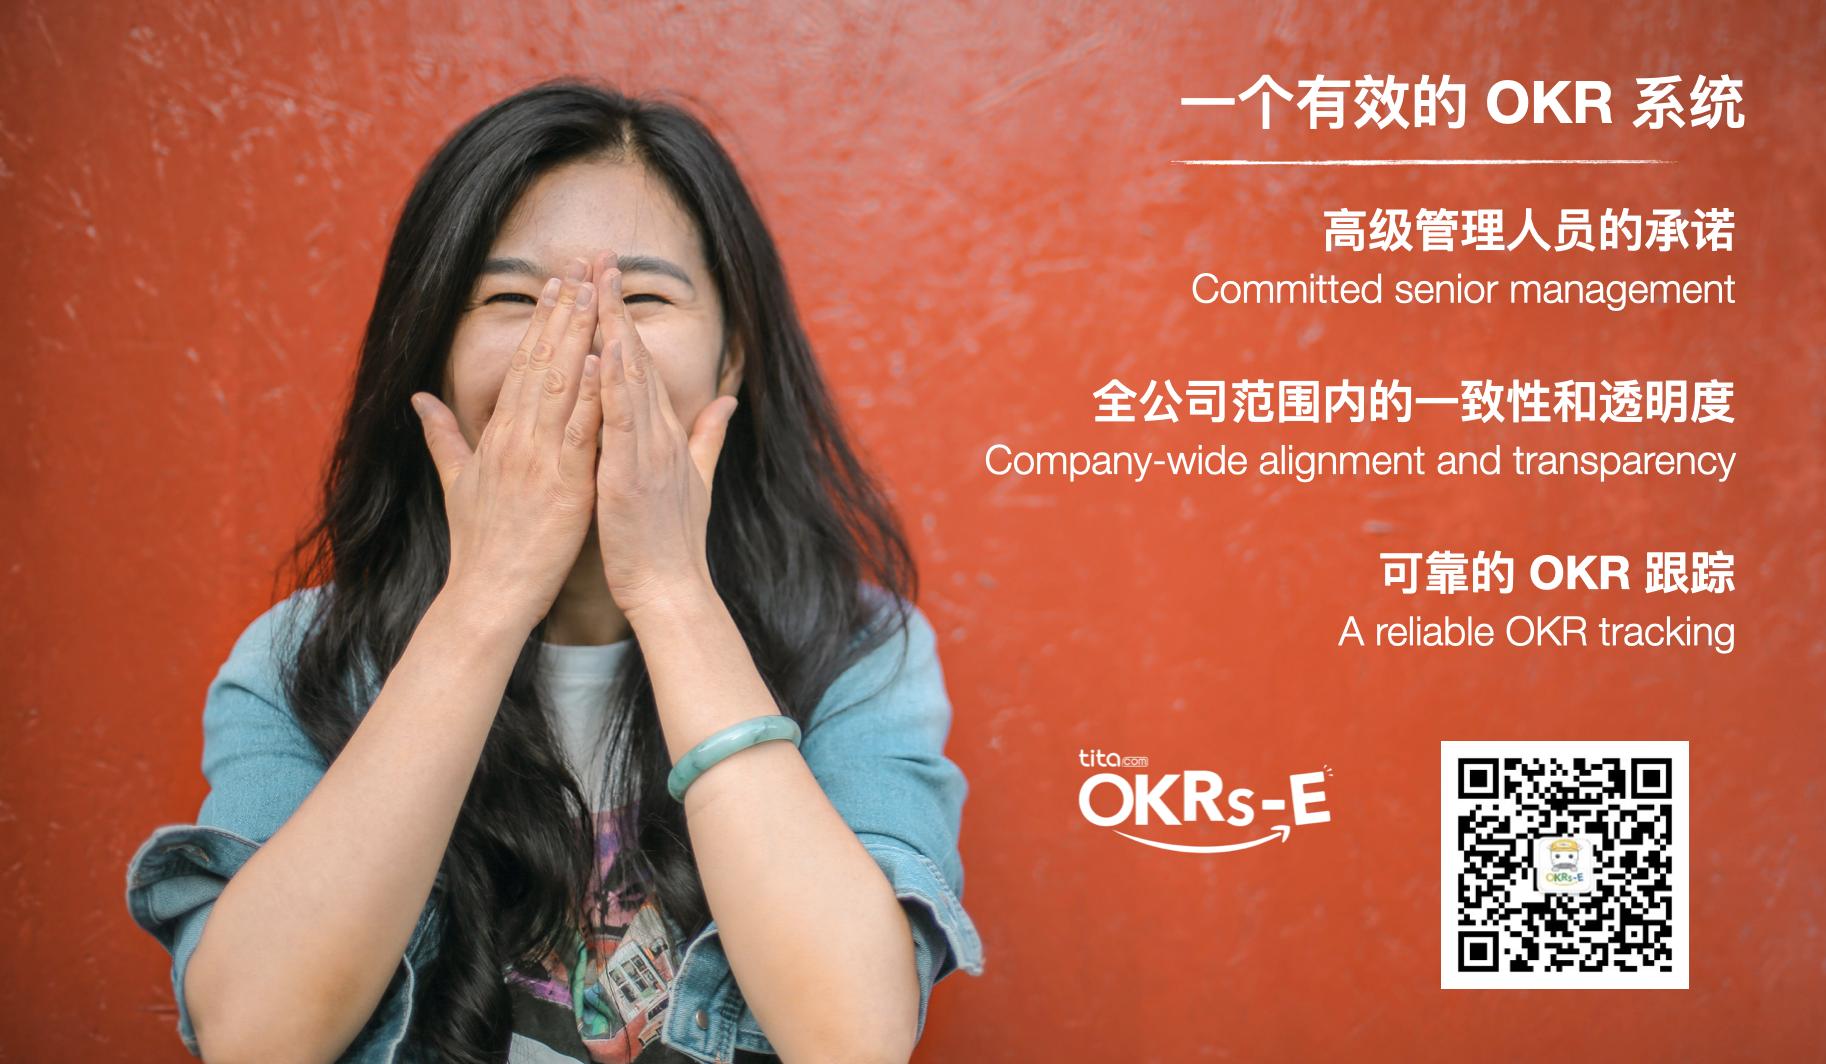 OKR 最佳「伴侣」 CFR ,帮助企业落地持续绩效考核